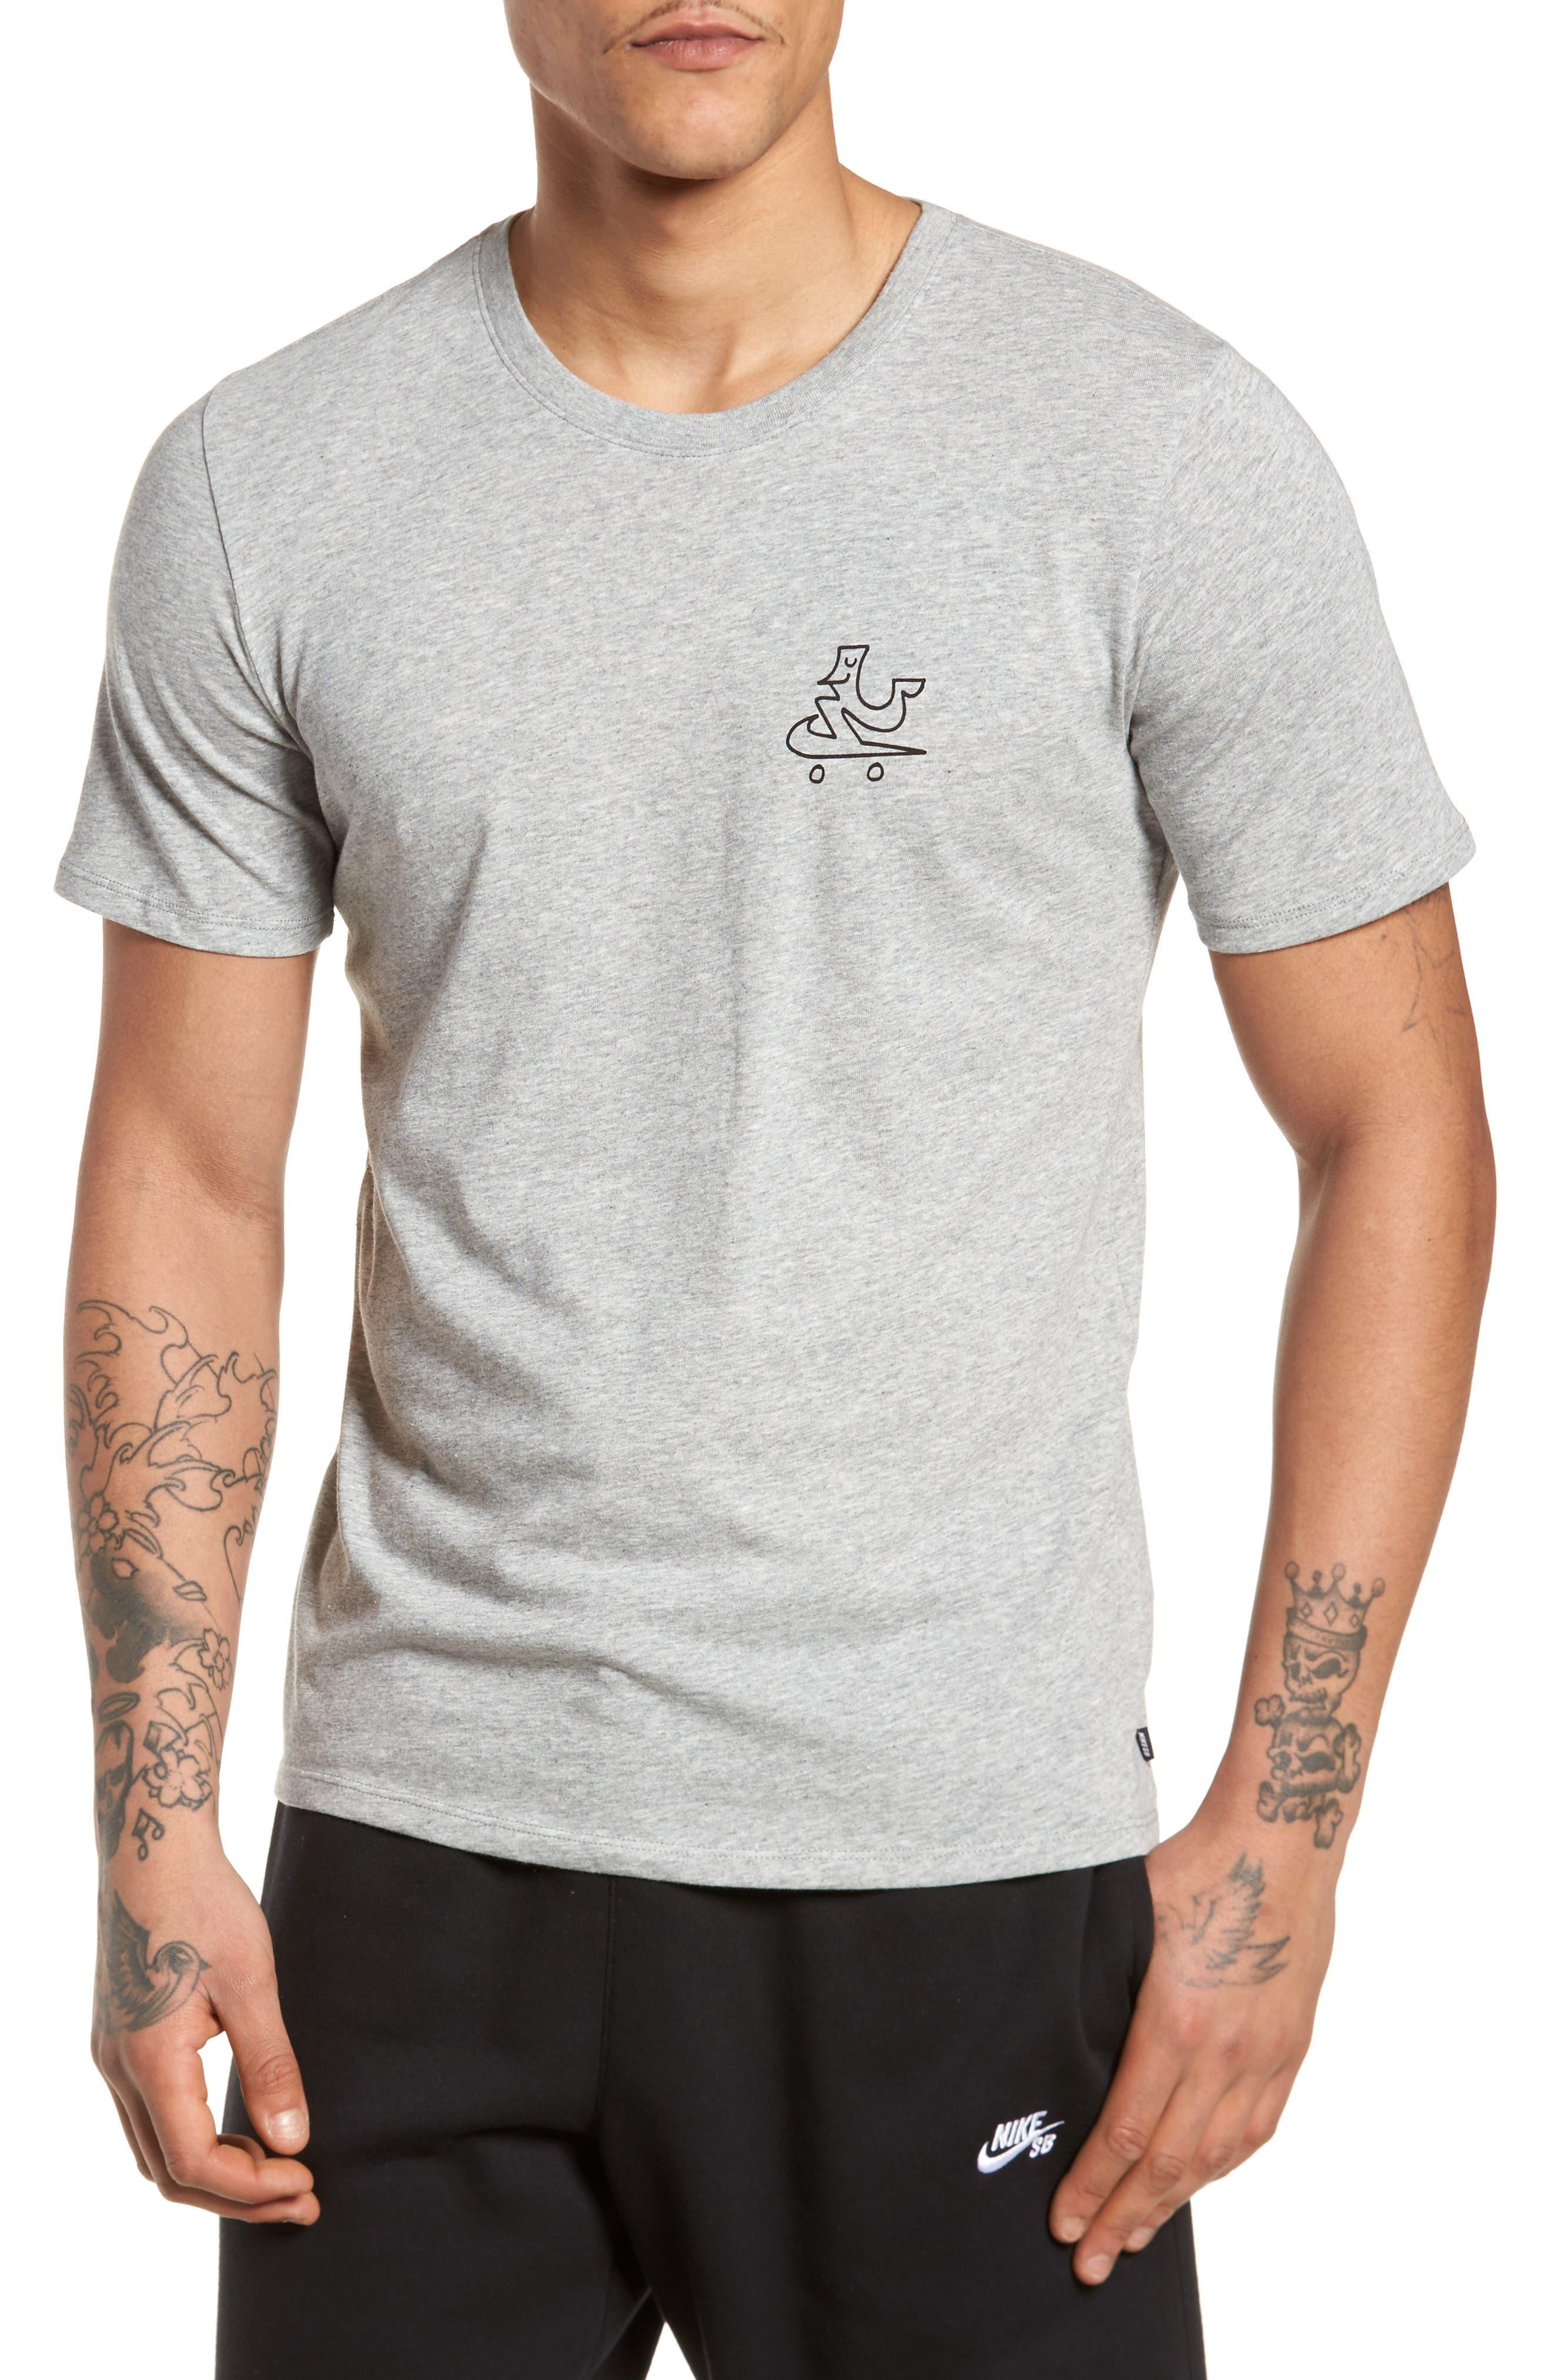 Dry Swooshie Crewneck T-Shirt,                             Main thumbnail 1, color,                             DARK GREY HEATHER/ BLACK